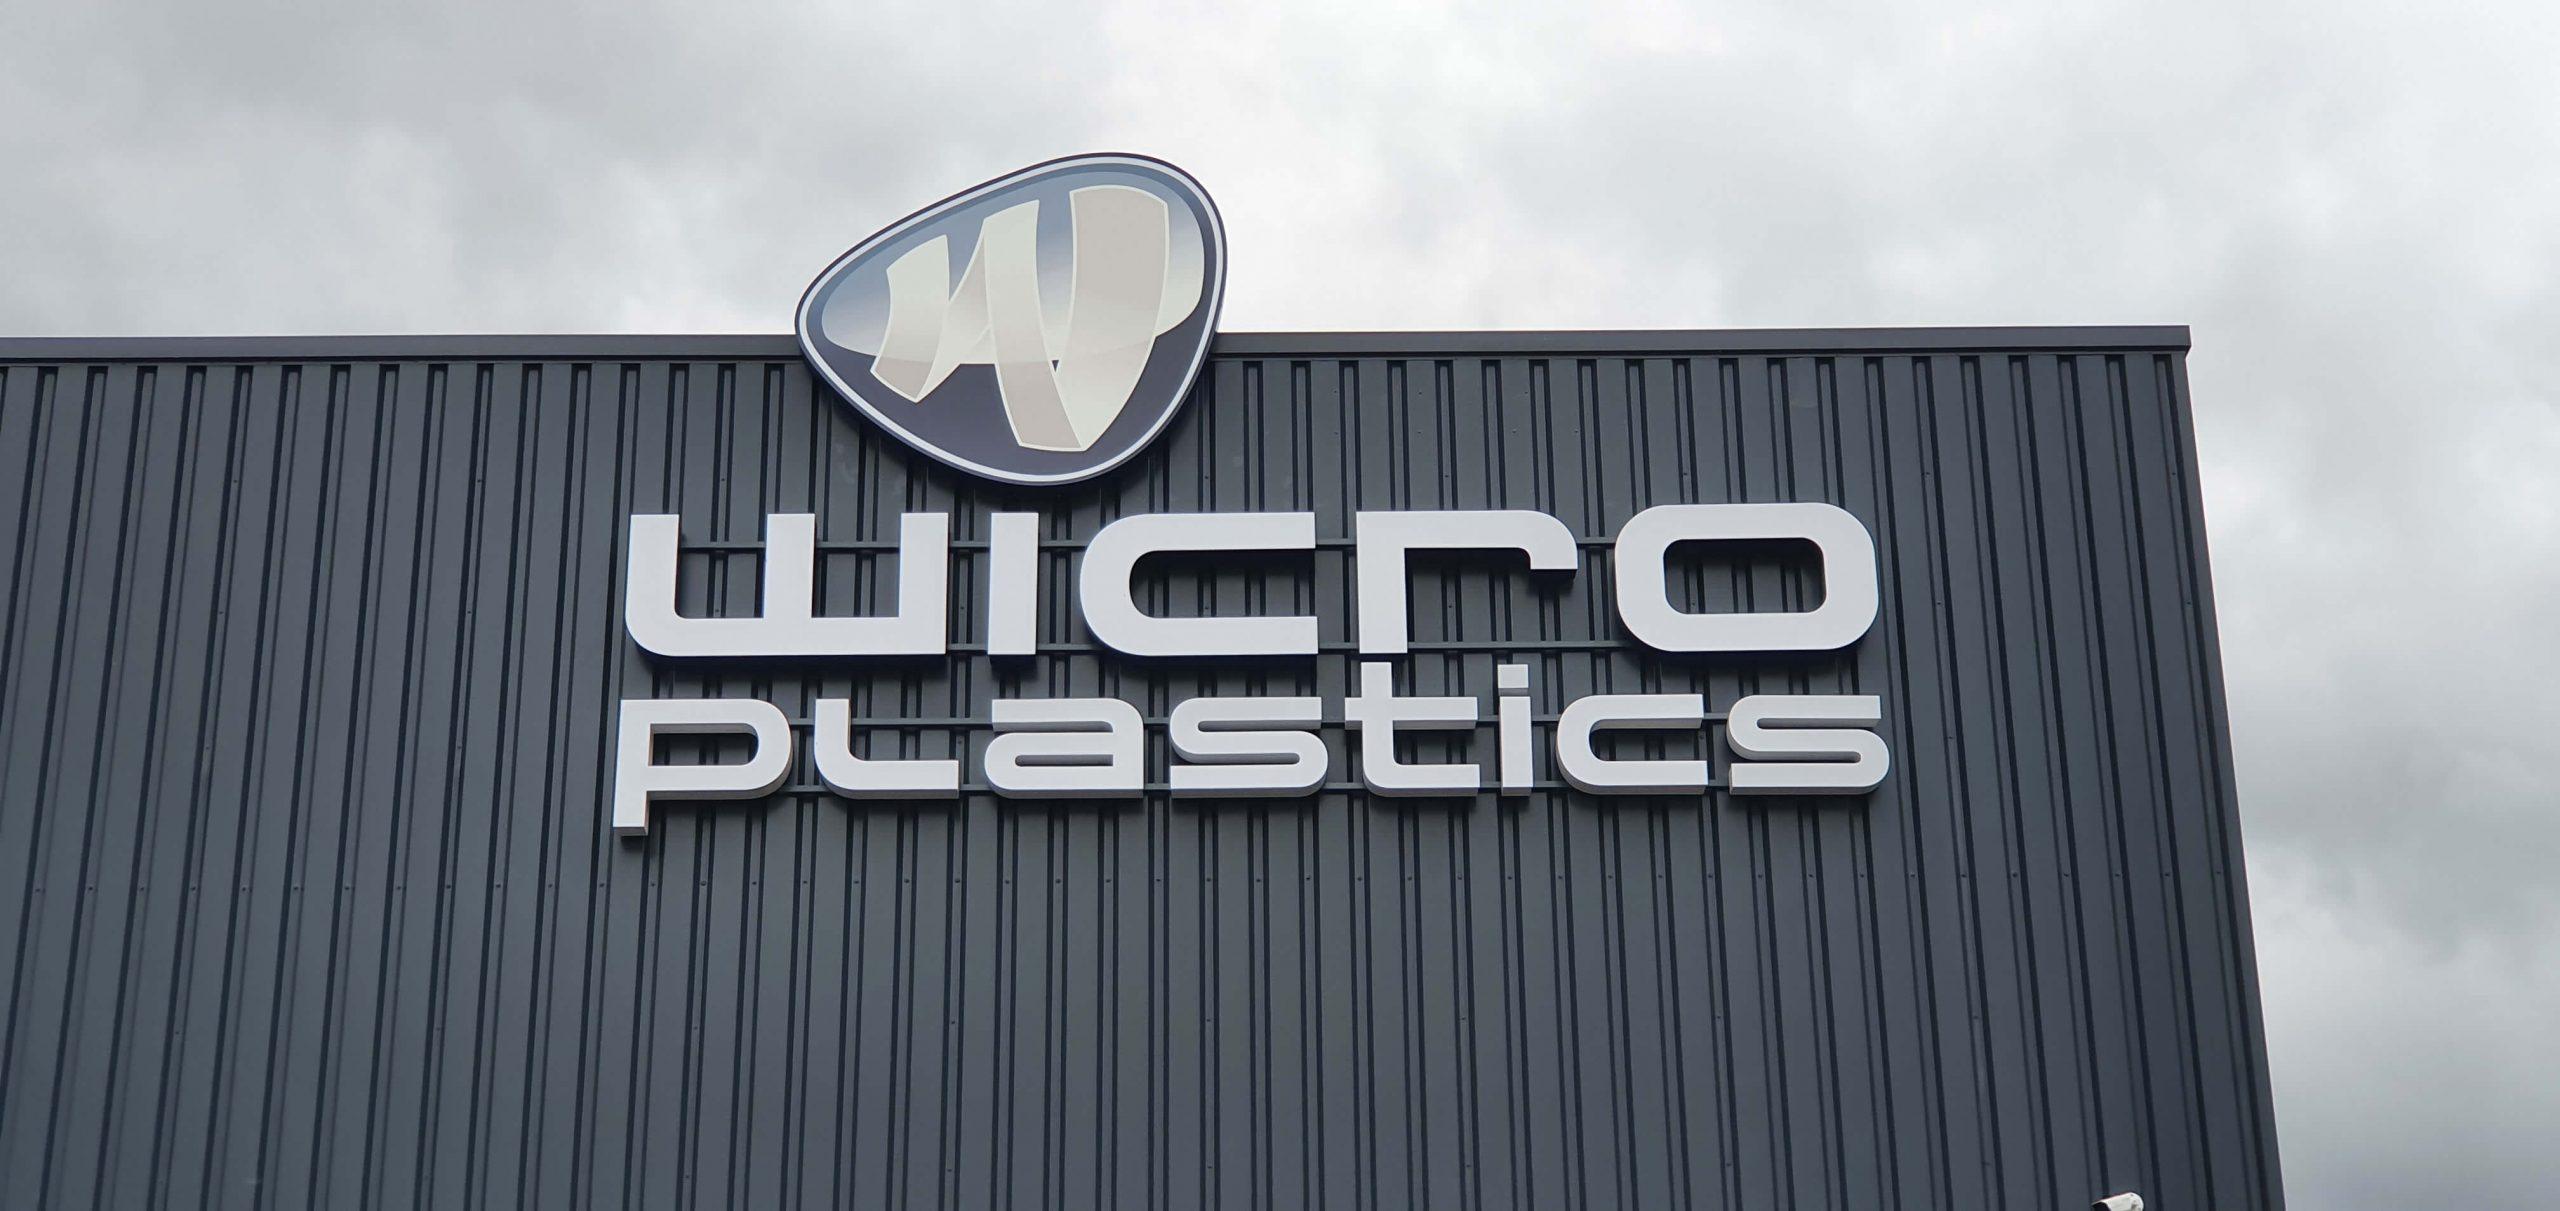 Gevelreclame bedrijfshal Wicro 6